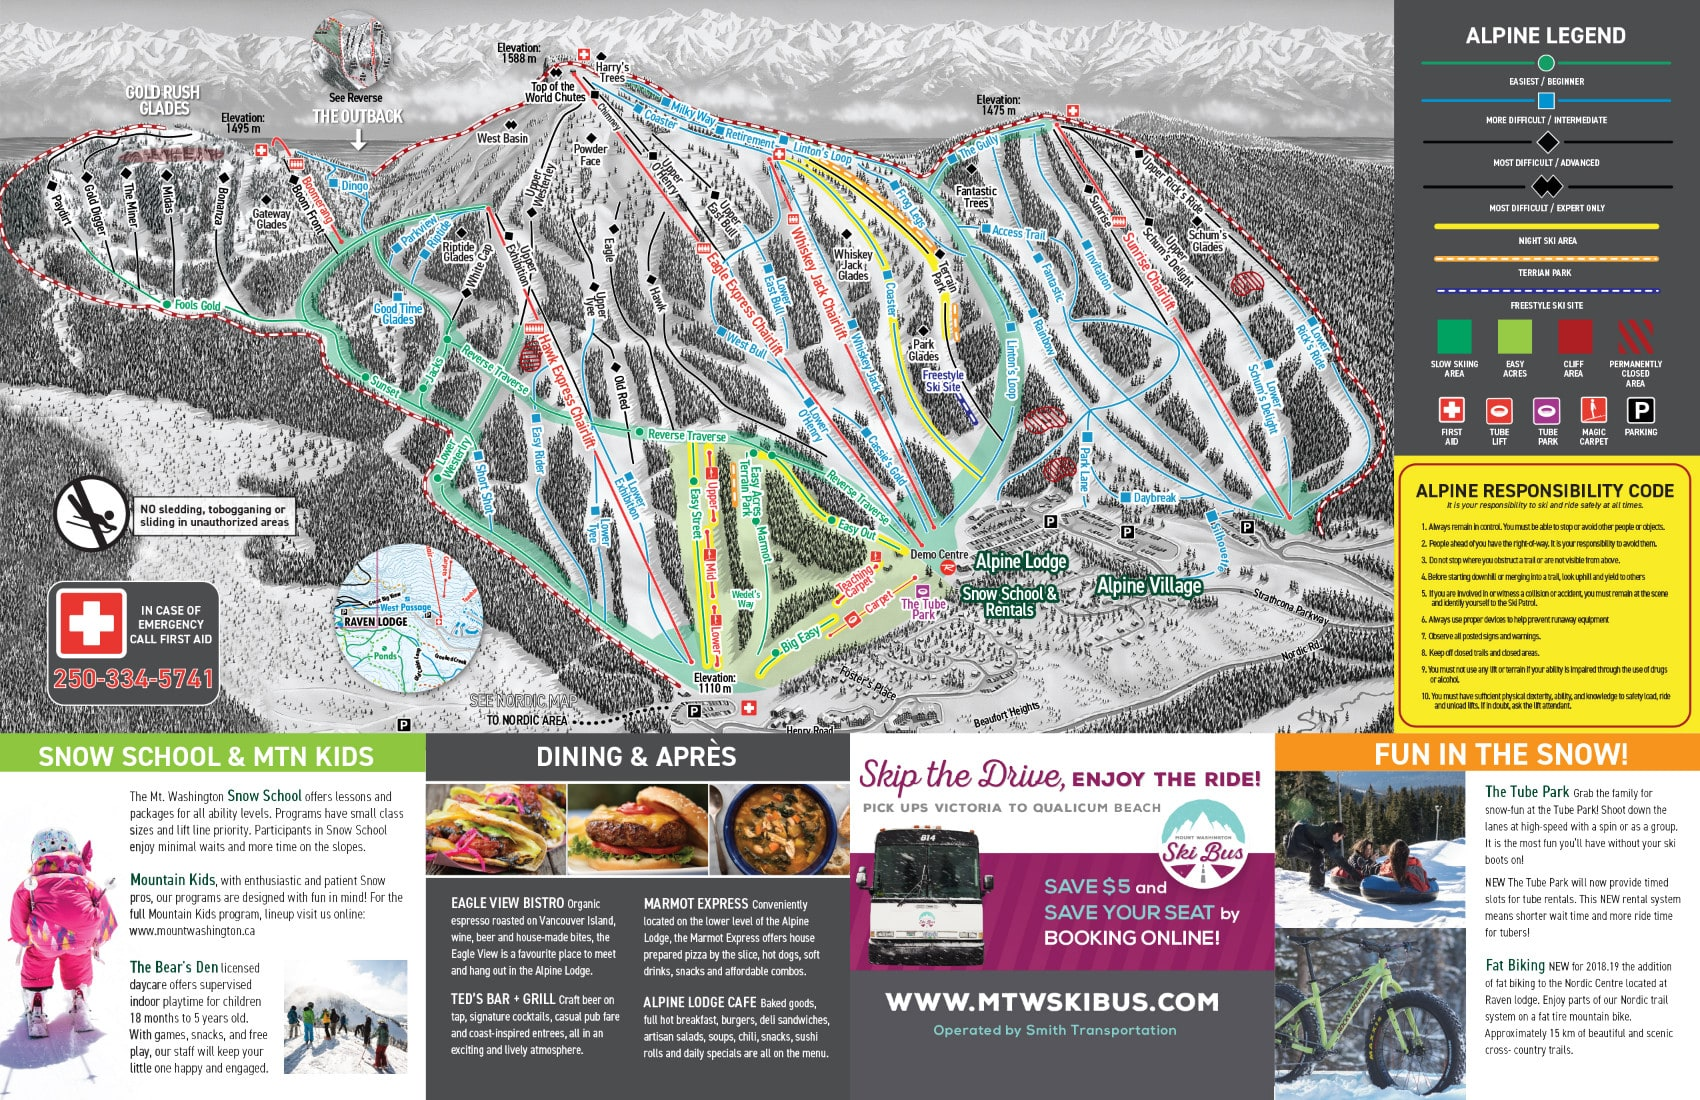 Mount Washington Ski Resort Guide Location Map  Mount Washington